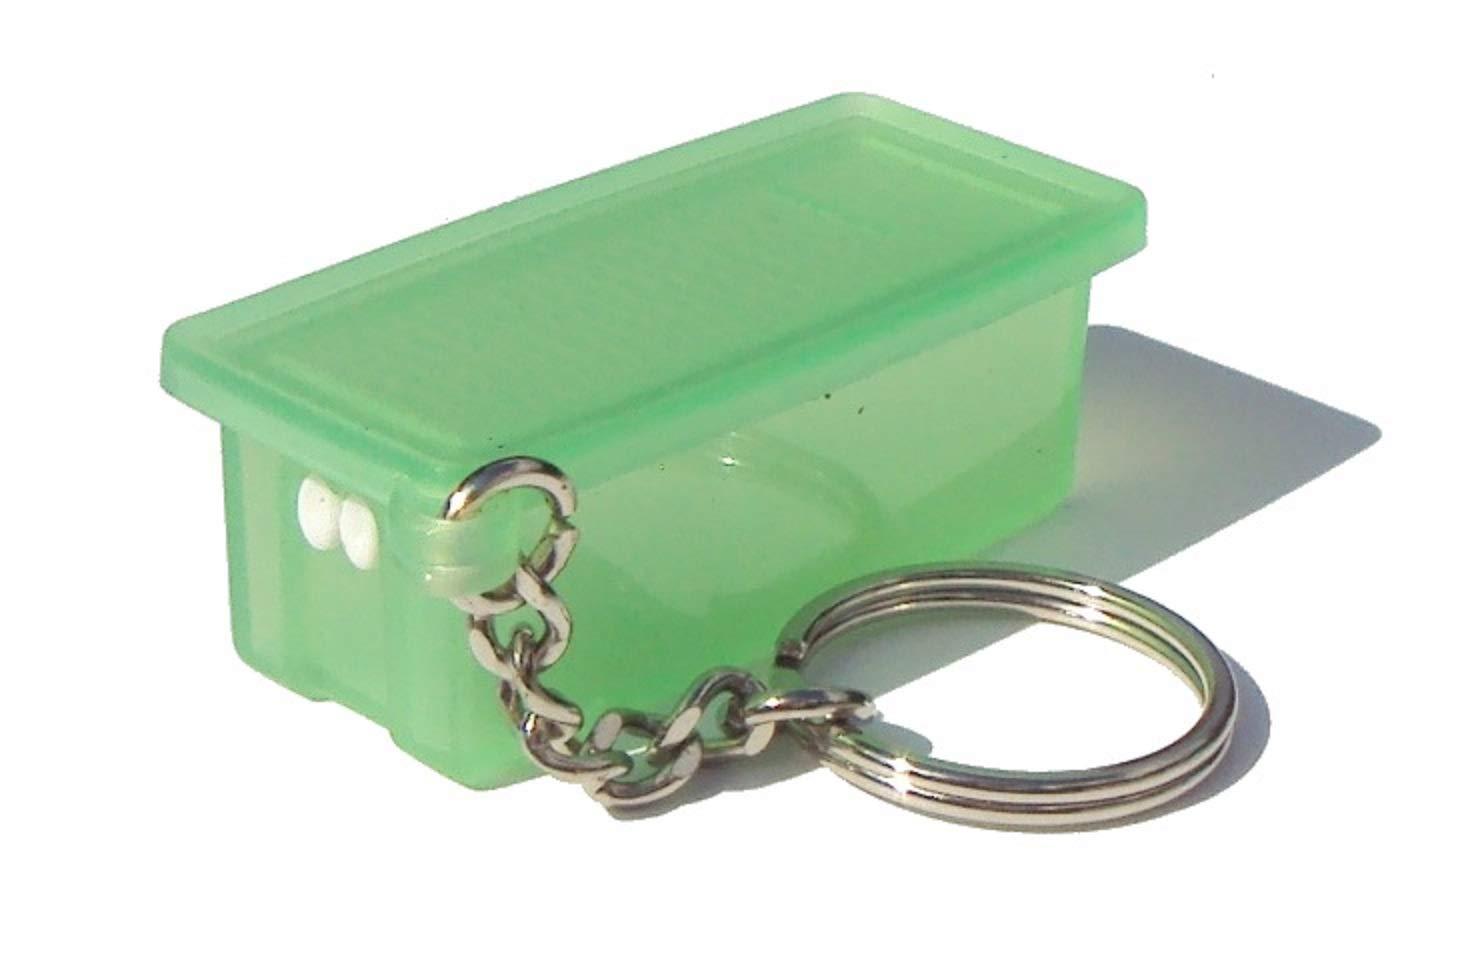 Tupperware Keychain FridgeSmart Pill Storer Green Free shipping